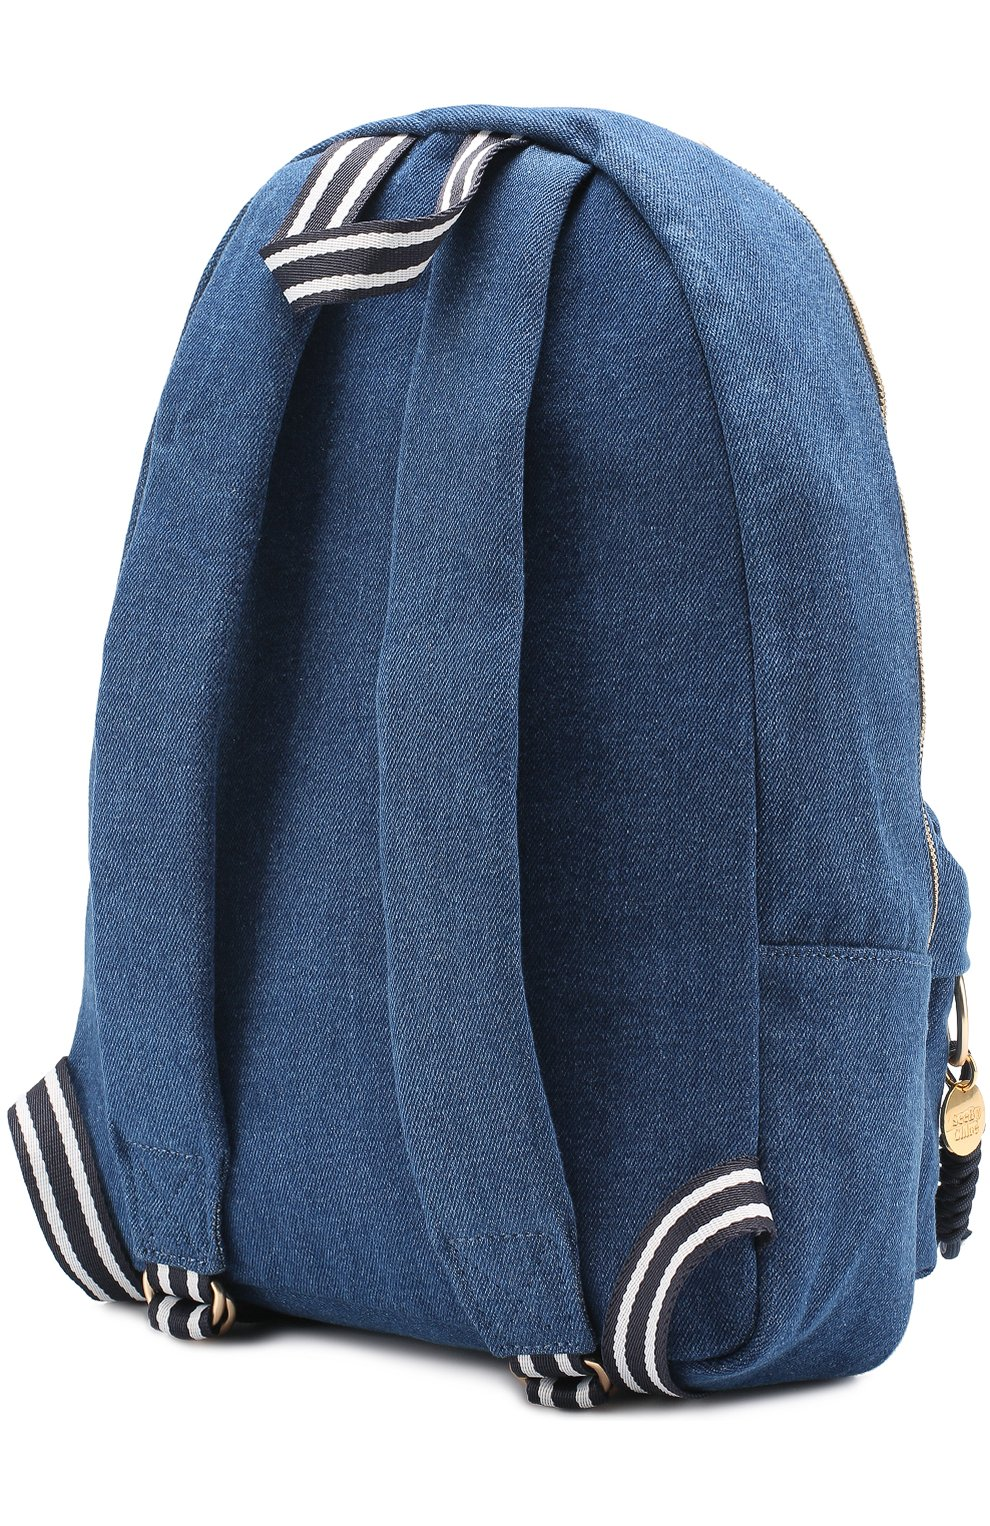 Рюкзак из денима с аппликацией   Фото №3